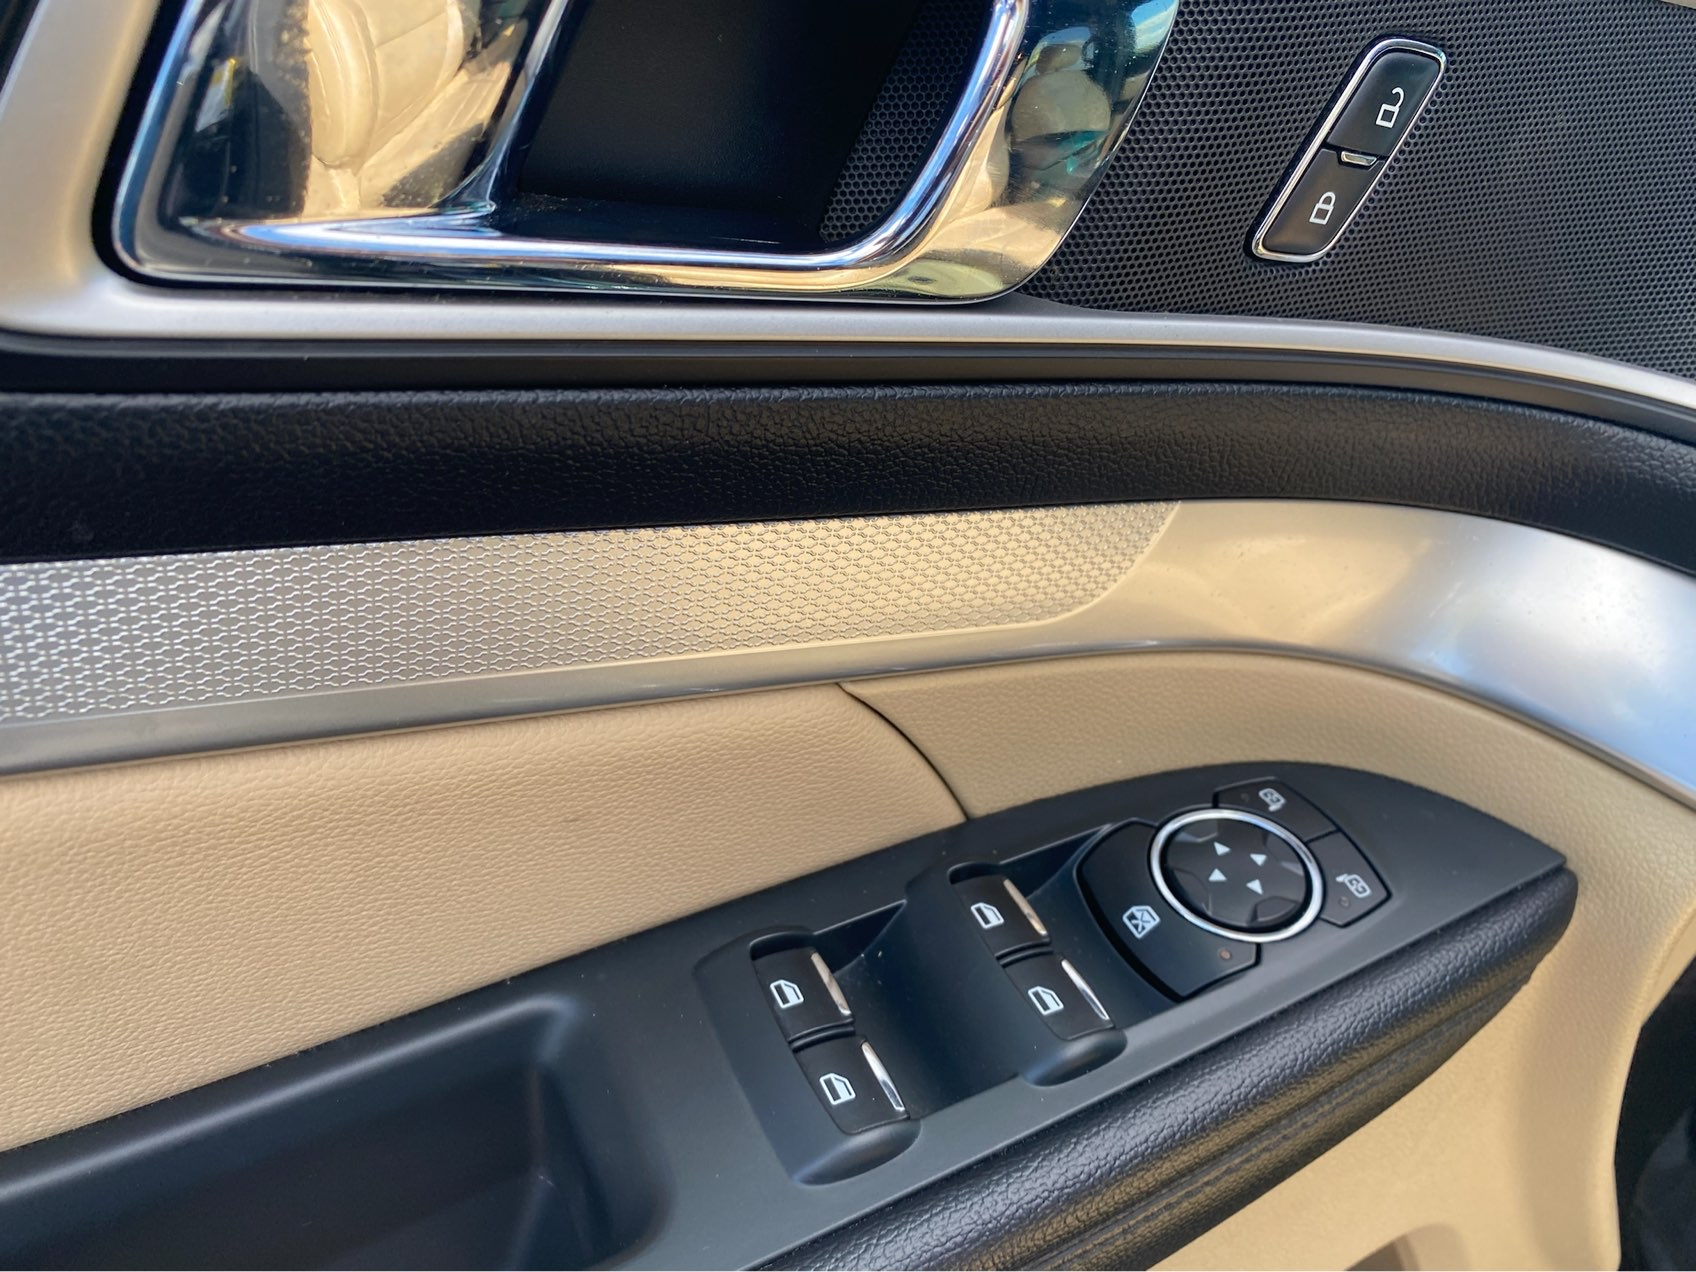 used vehicle - SUV FORD EXPLORER 2017